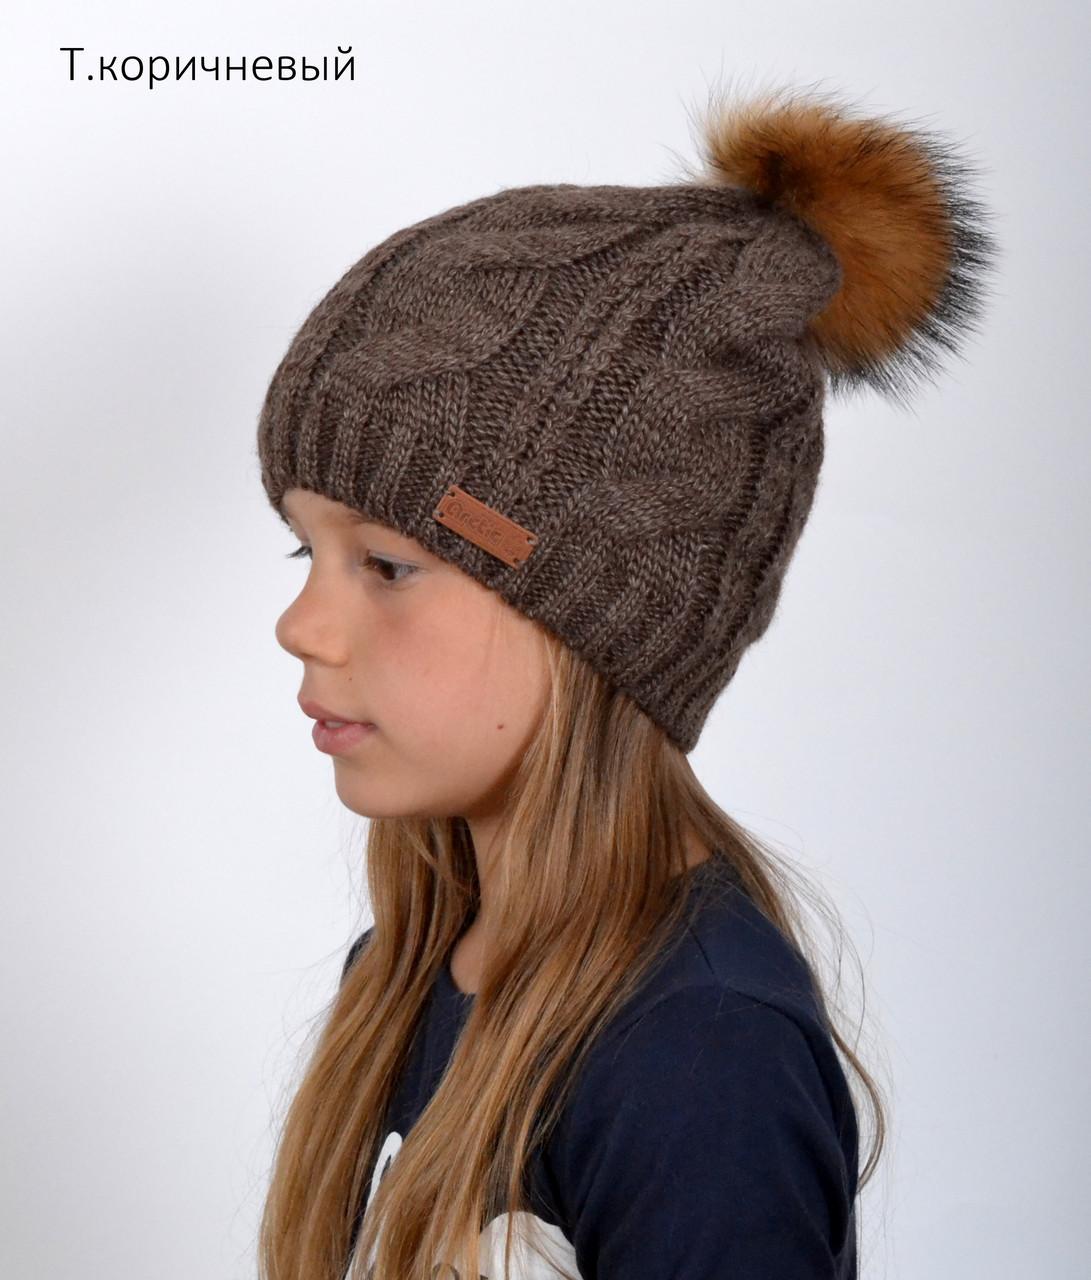 Жіноча в'язана шапка з помпоном з натурального хутра